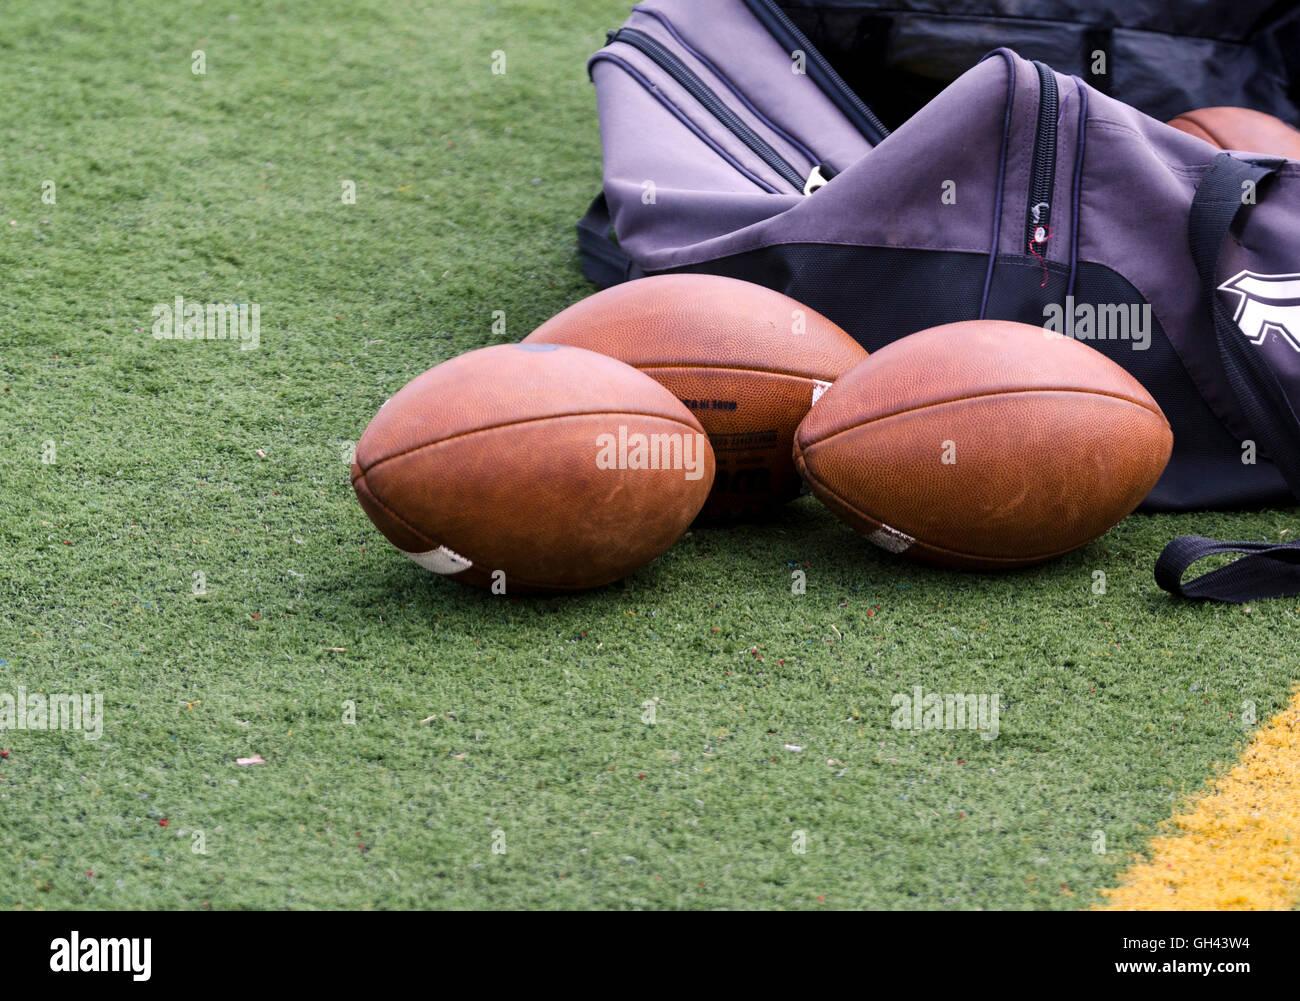 Footballs on sideline - Stock Image